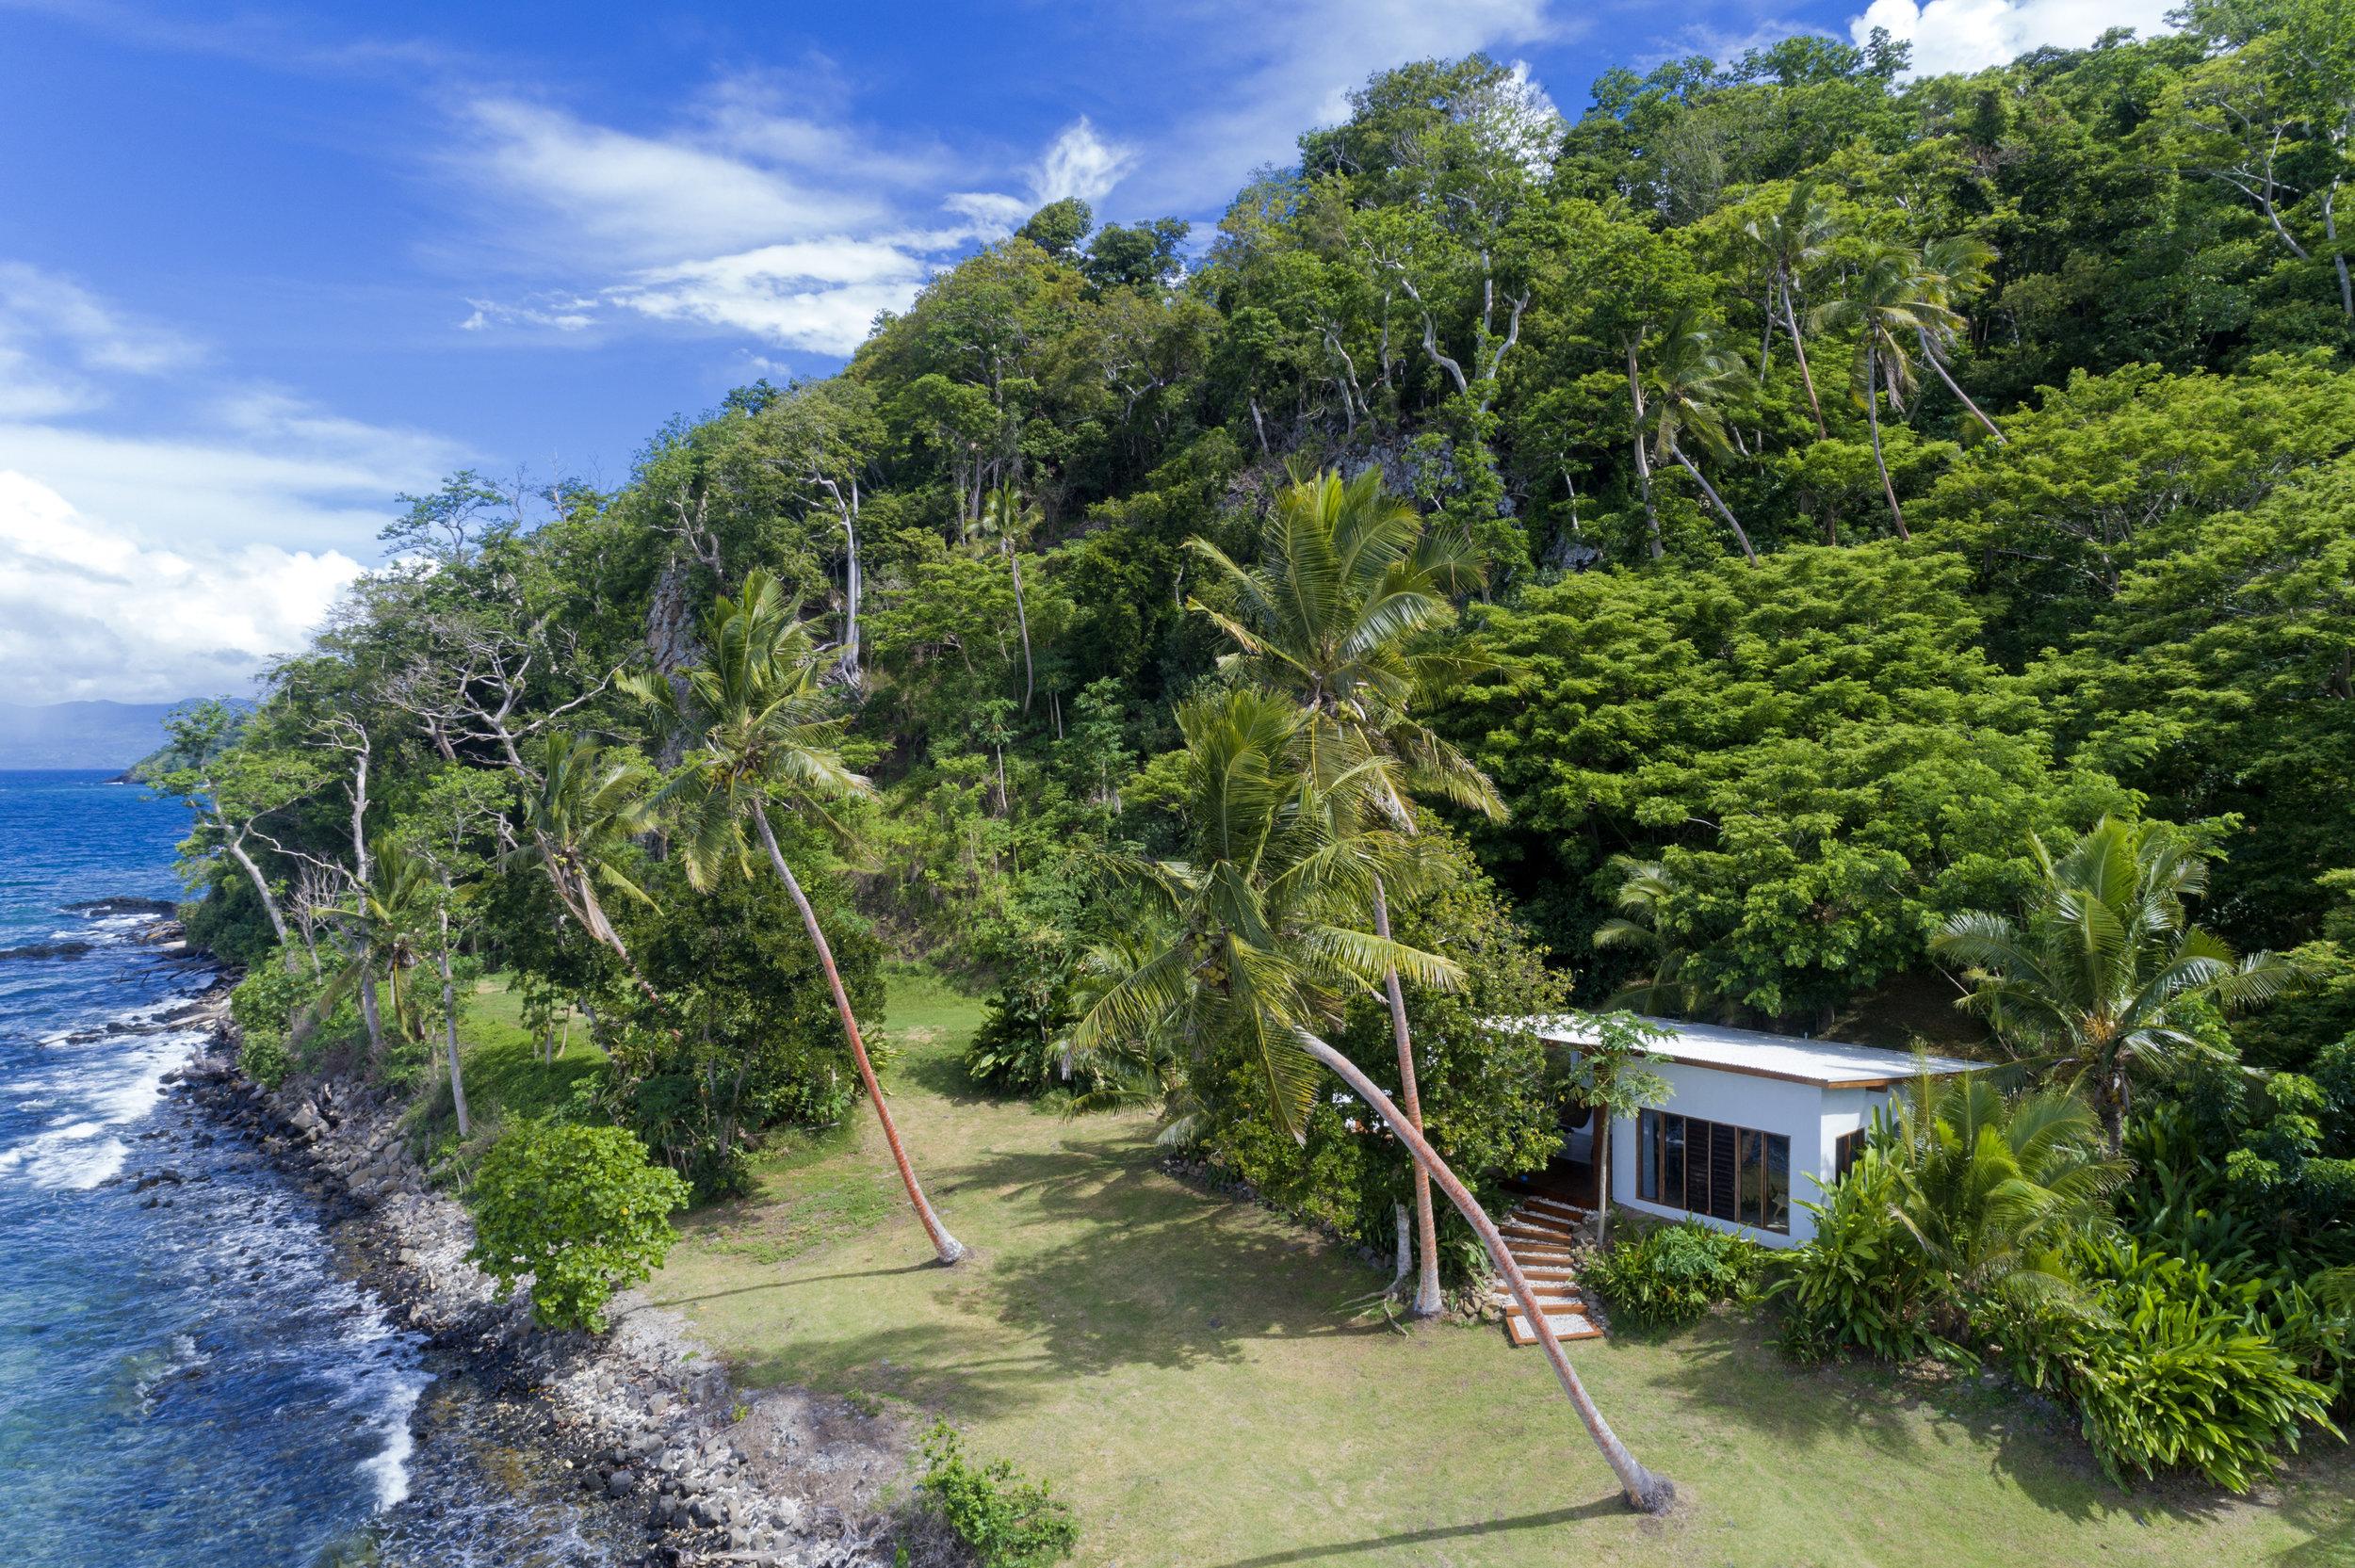 Fiji Resort - Couples Accommodation - Royal Retreat - Honeymoon - The Remote Resort10.jpg